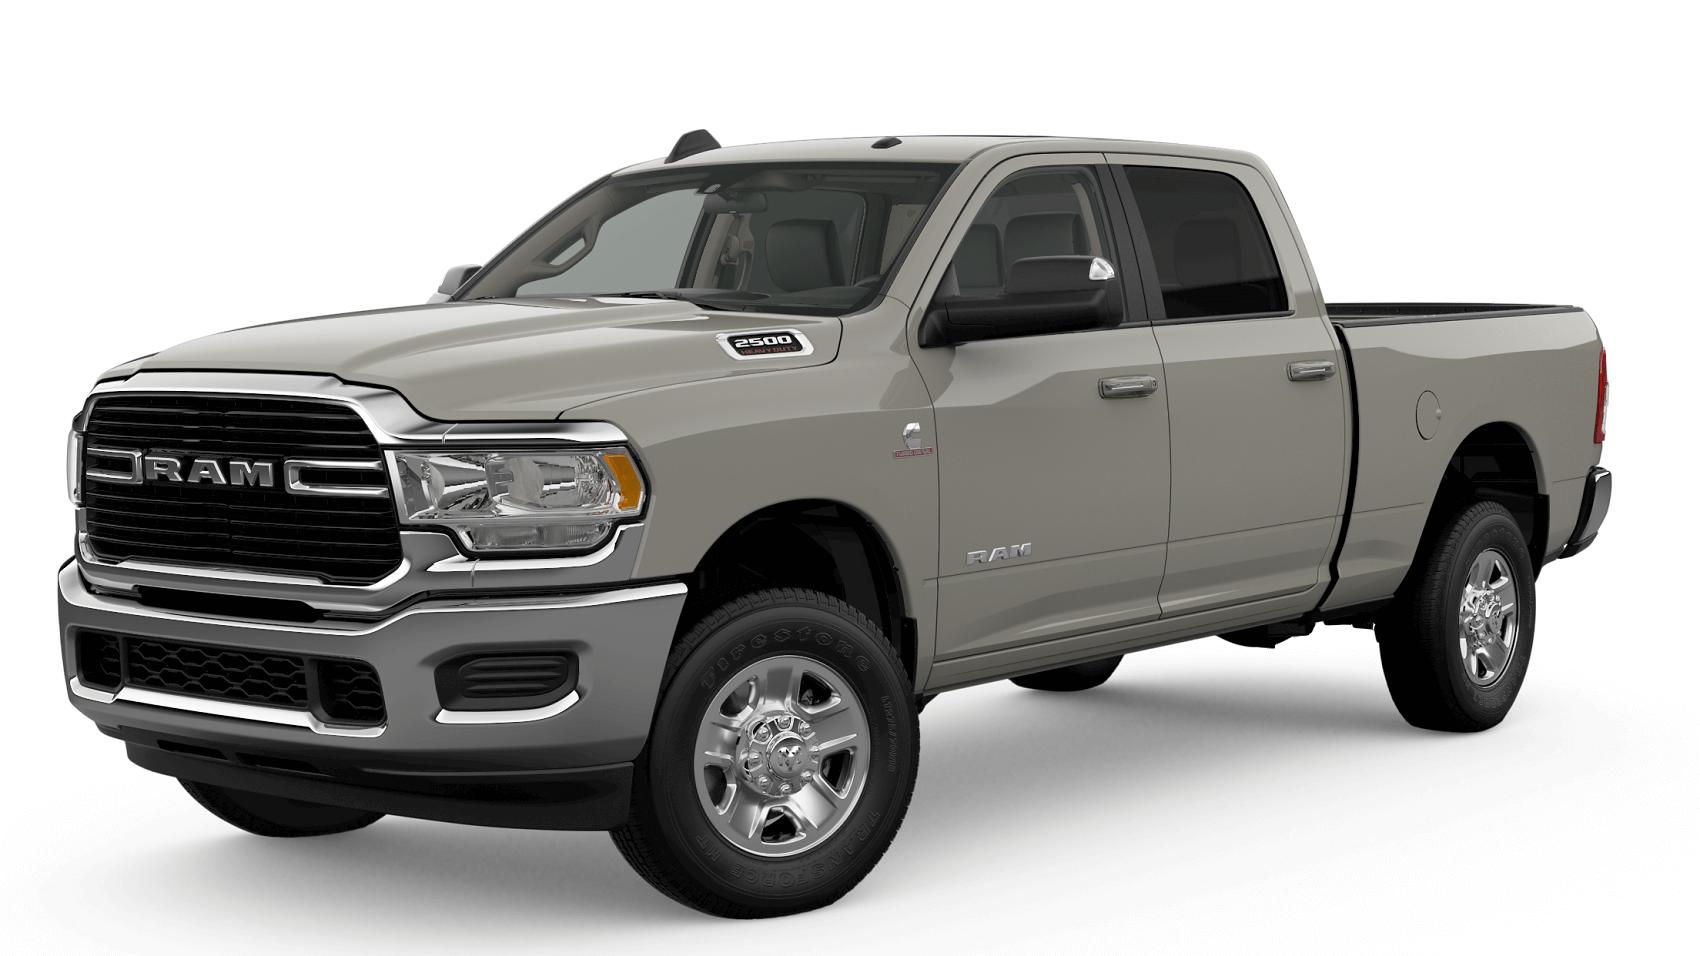 Ram 2500 for Sale Savannah GA